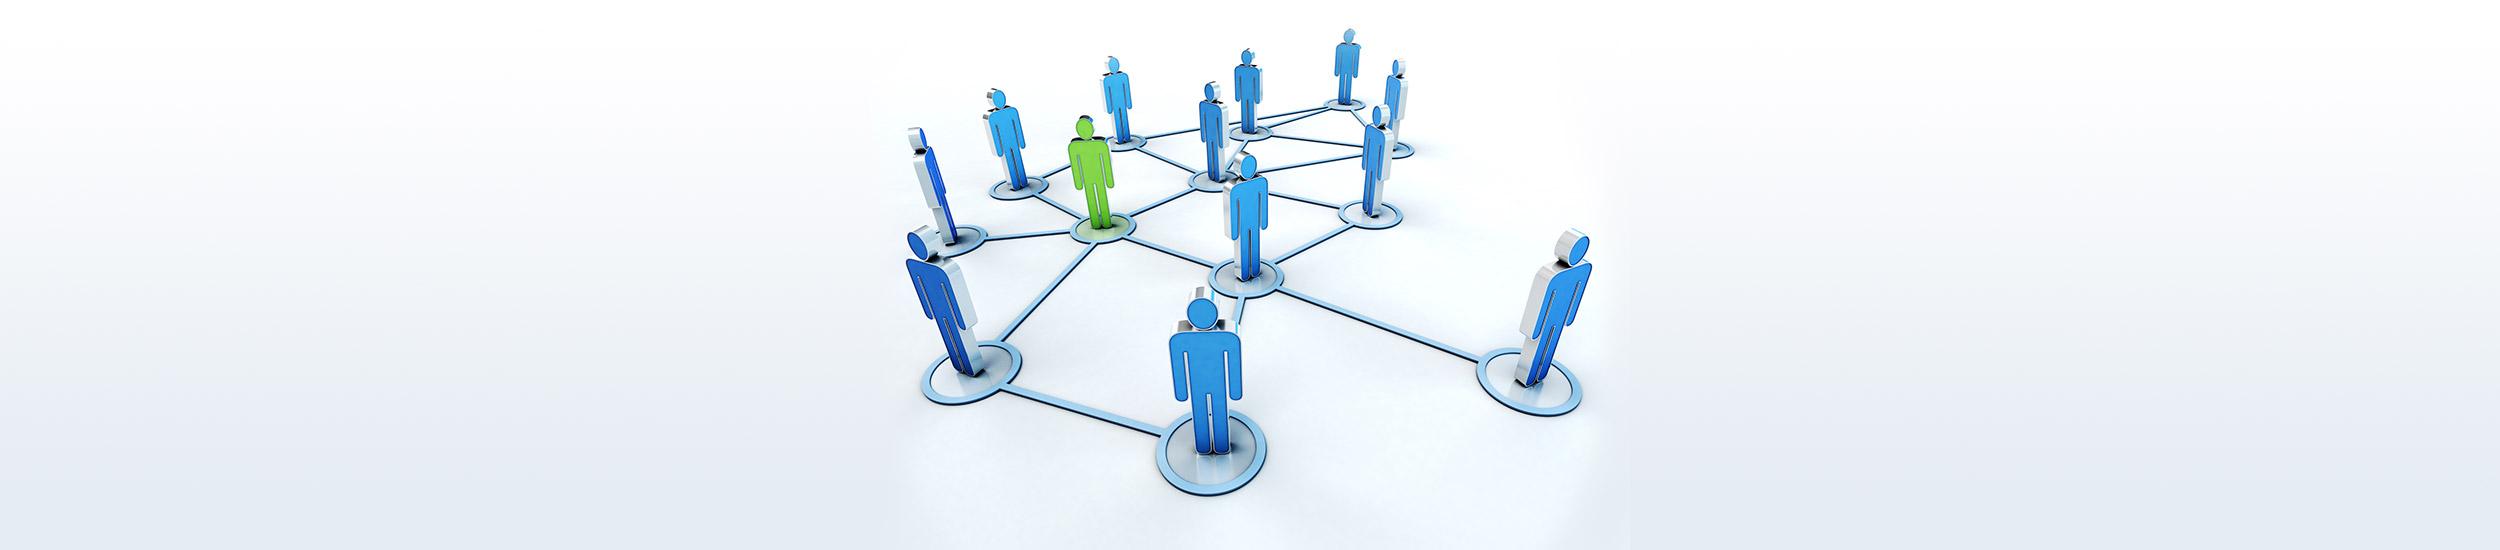 Netzwerkmodell